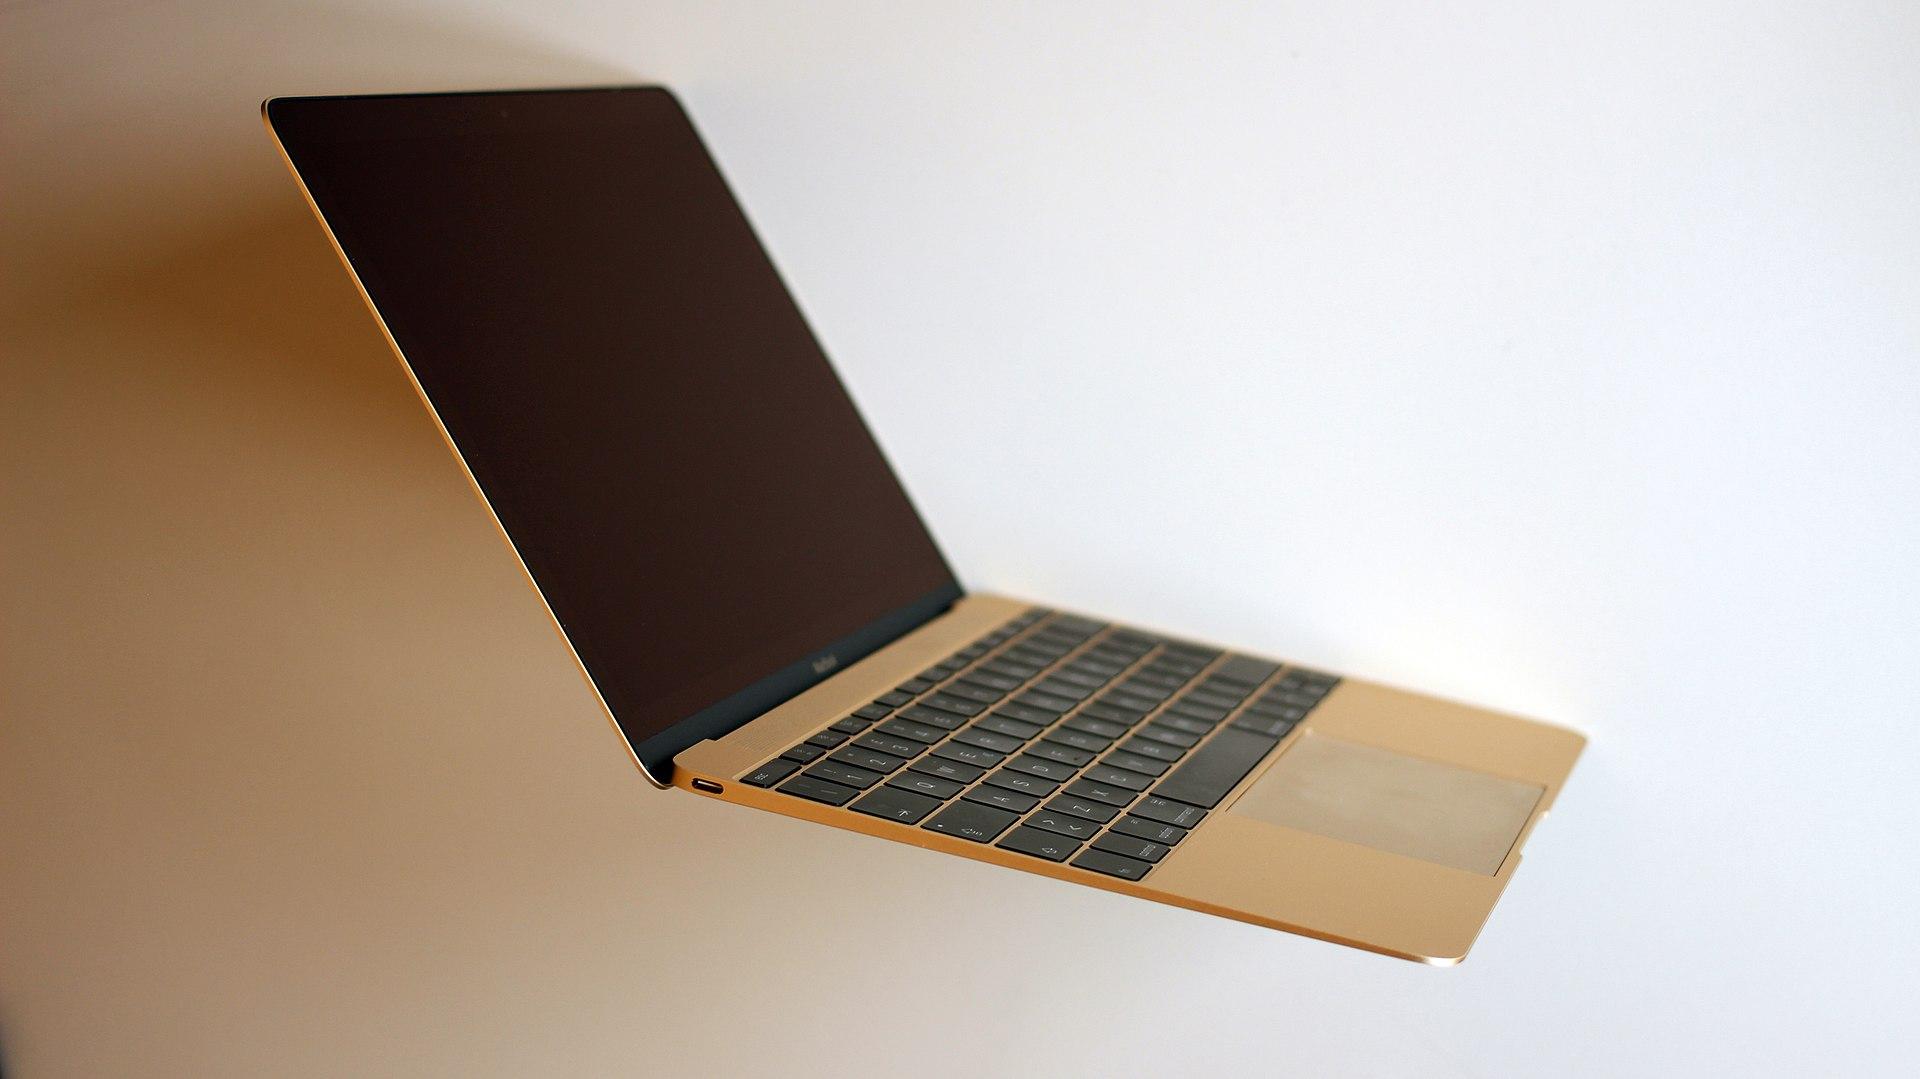 macbook ファームウェア パスワード 解除